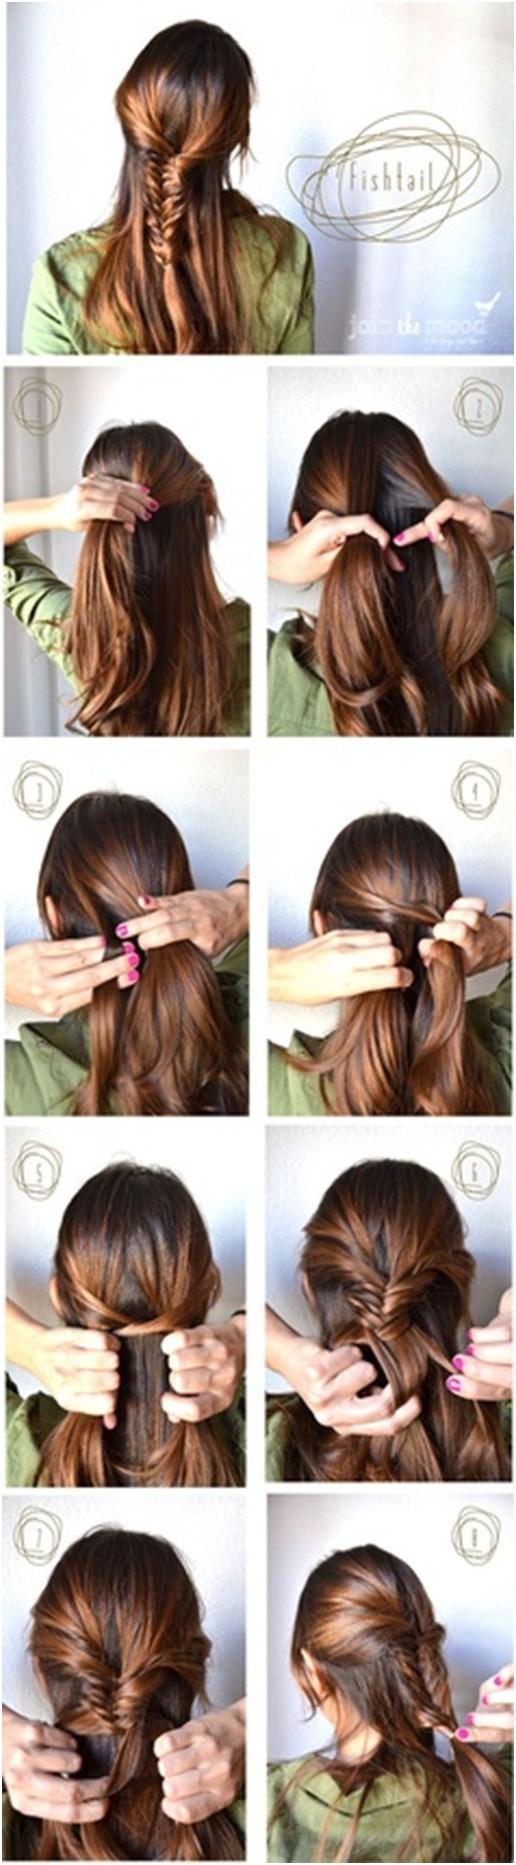 Easy DIY Braids for Long Hair